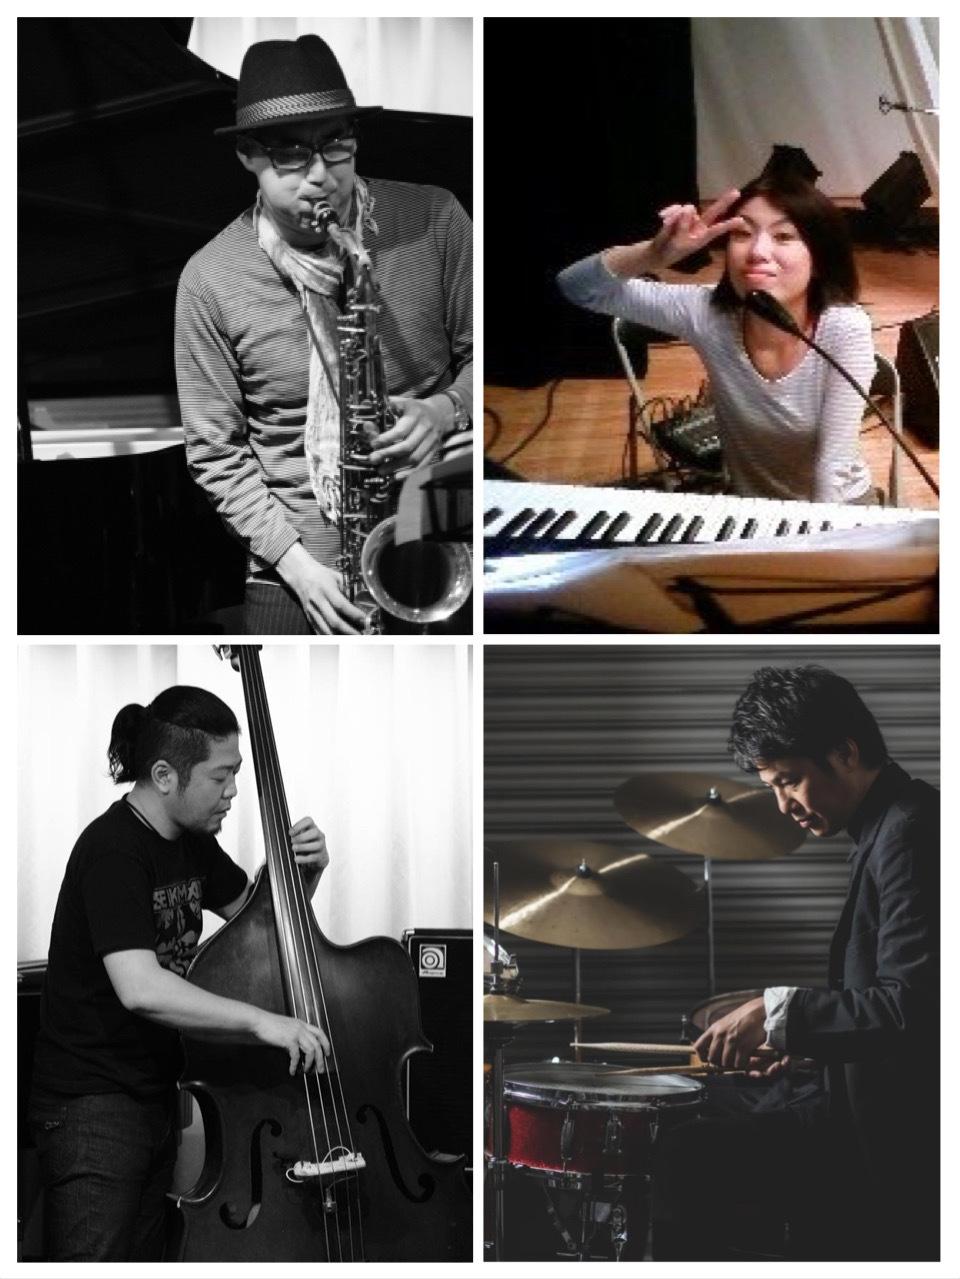 Jazzlive Comin ジャズライブカミン 広島 本日4月20日のライブ_b0115606_11250103.jpeg